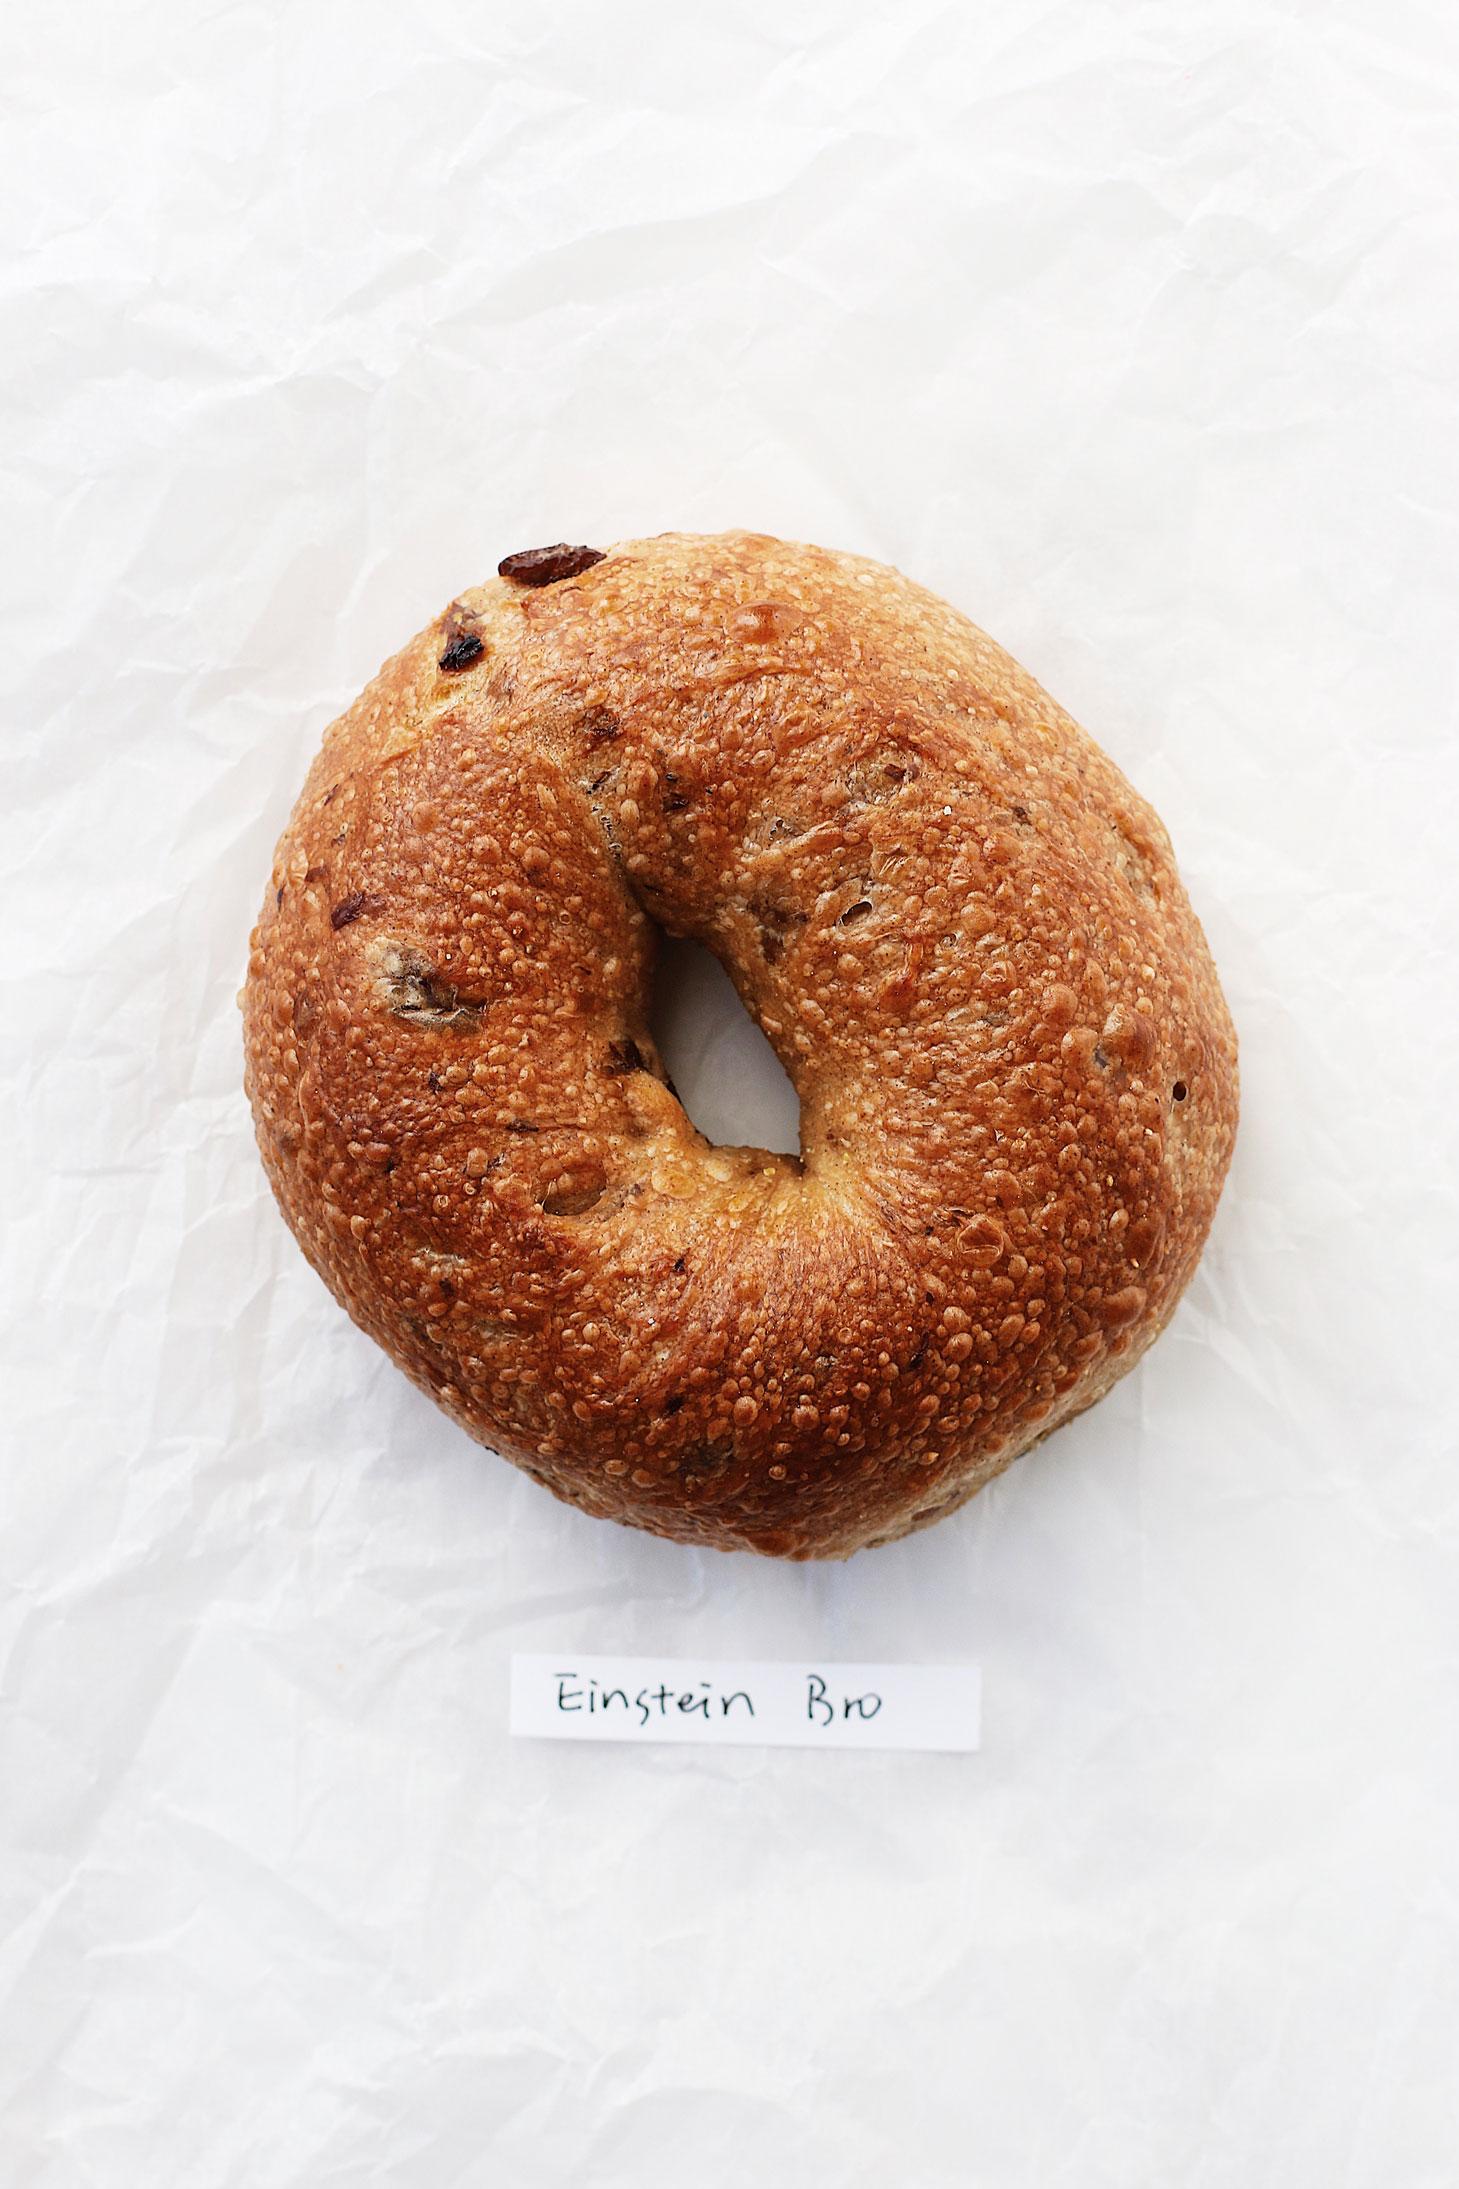 best-bagel-in-seattle-great-bagel-off-einstein-bro-cinnamon-rainsin